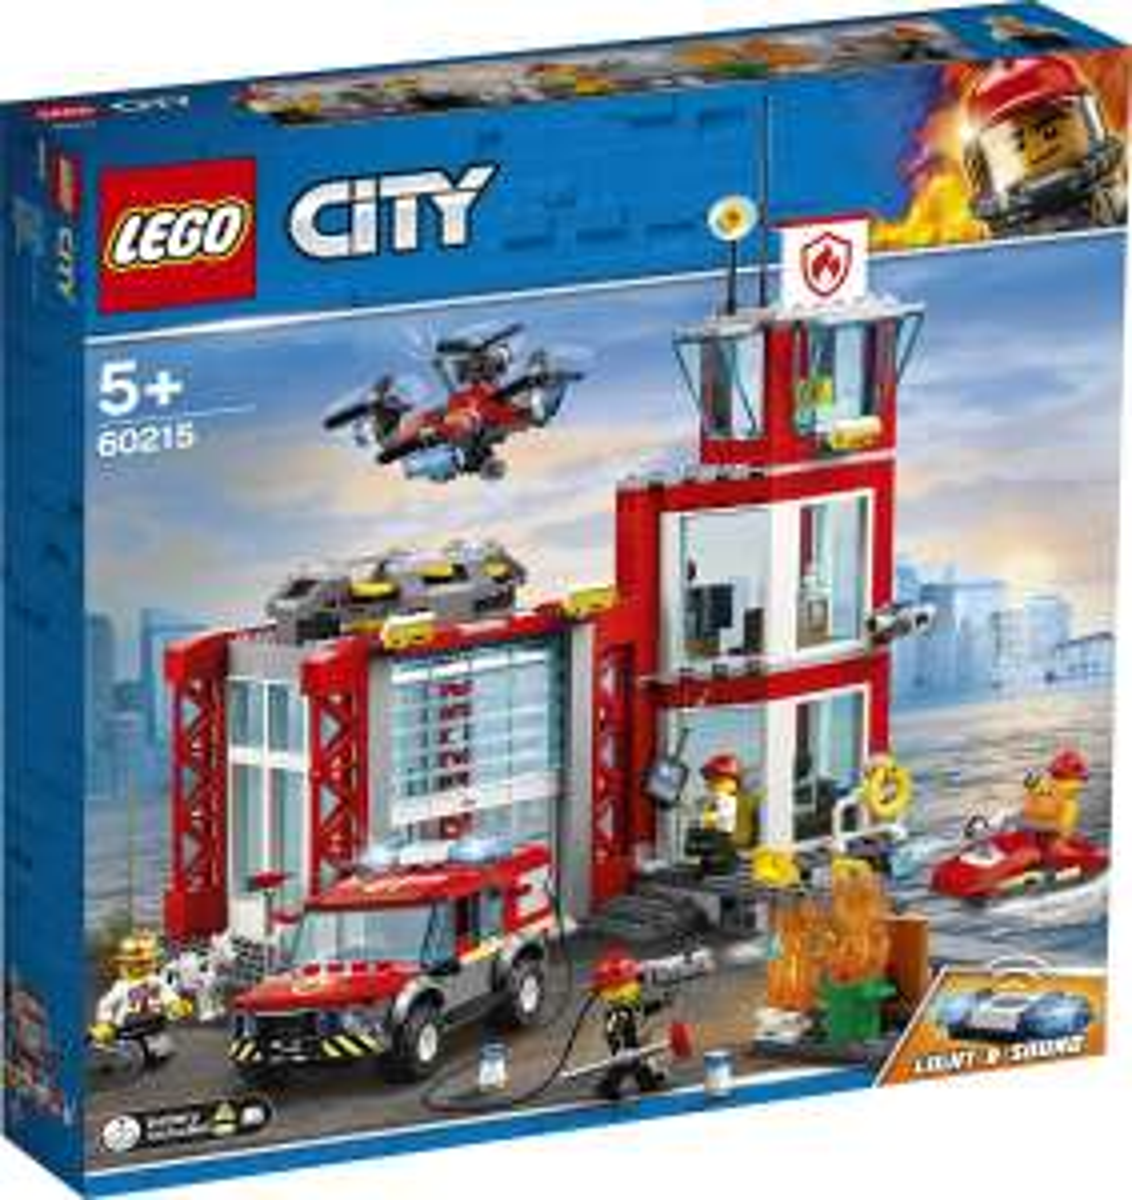 Lego City - 60215 - Brandweerkazerne + Gratis Lego Easter Bunny polybag.